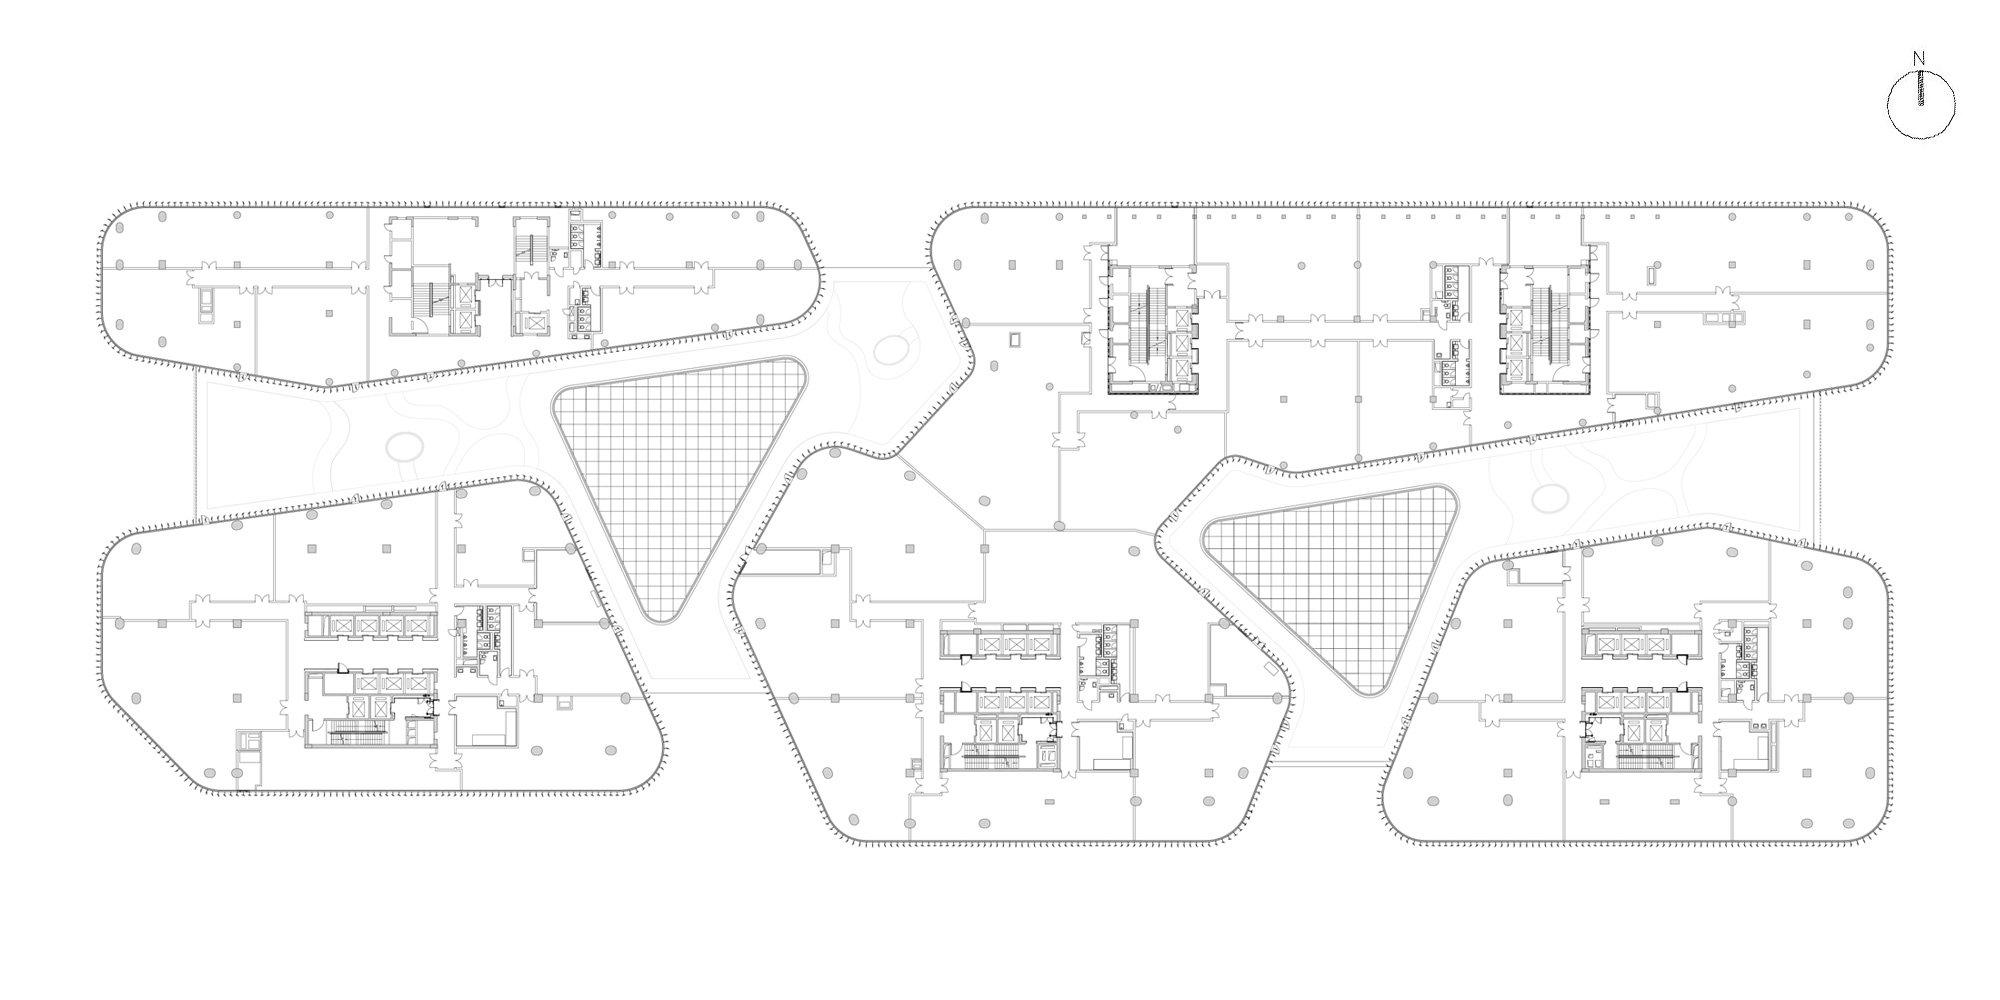 Pianta Piano Terzo © gmp - von Gerkan, Marg and Partners Architects